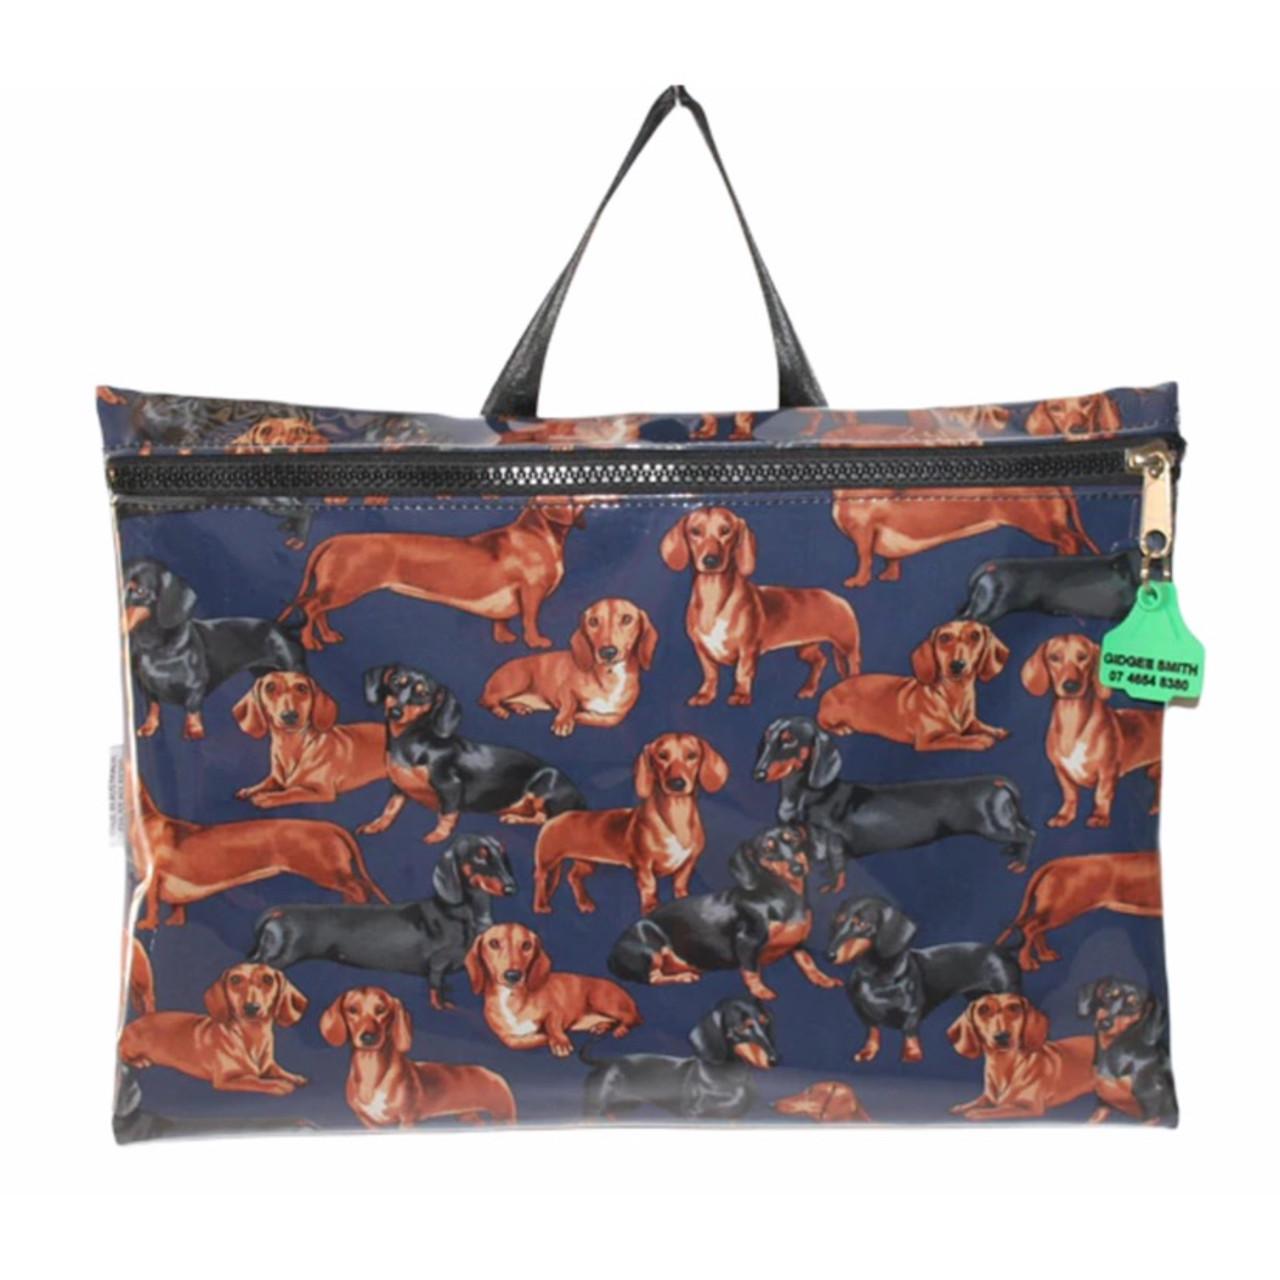 Library Bag  fabric finish 47cm L x 33cm H Australian Made pvc gear bags